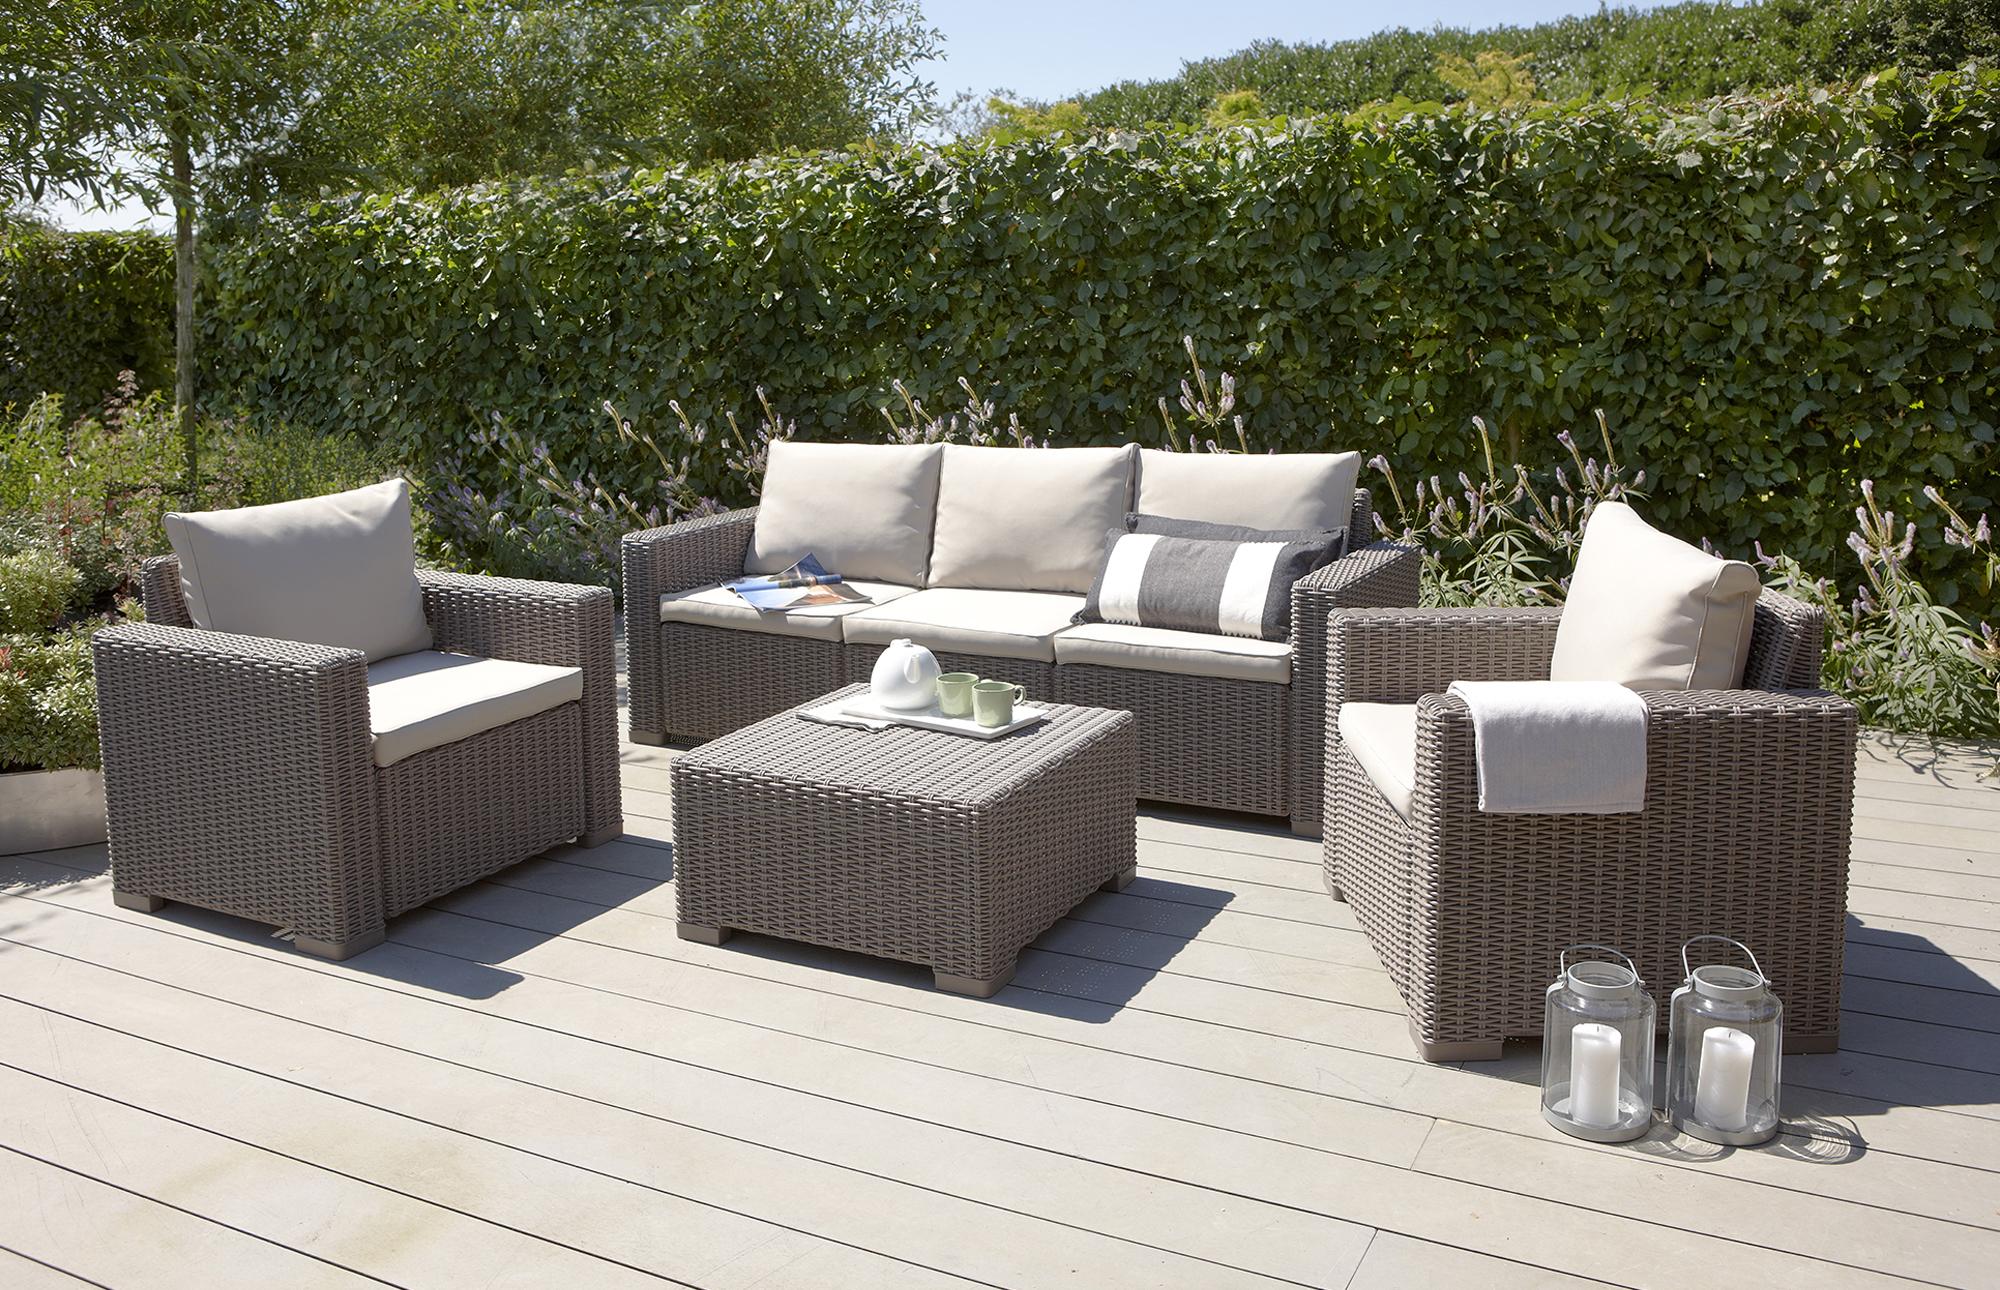 garden patio sets garden-furniture-rattan-sets-breathtaking-rattan-garden-furniture-bistro- sets-breathtaking-outdoor-patio-furniture-covers - rattan garden furniture  sets ... DBMBUAW